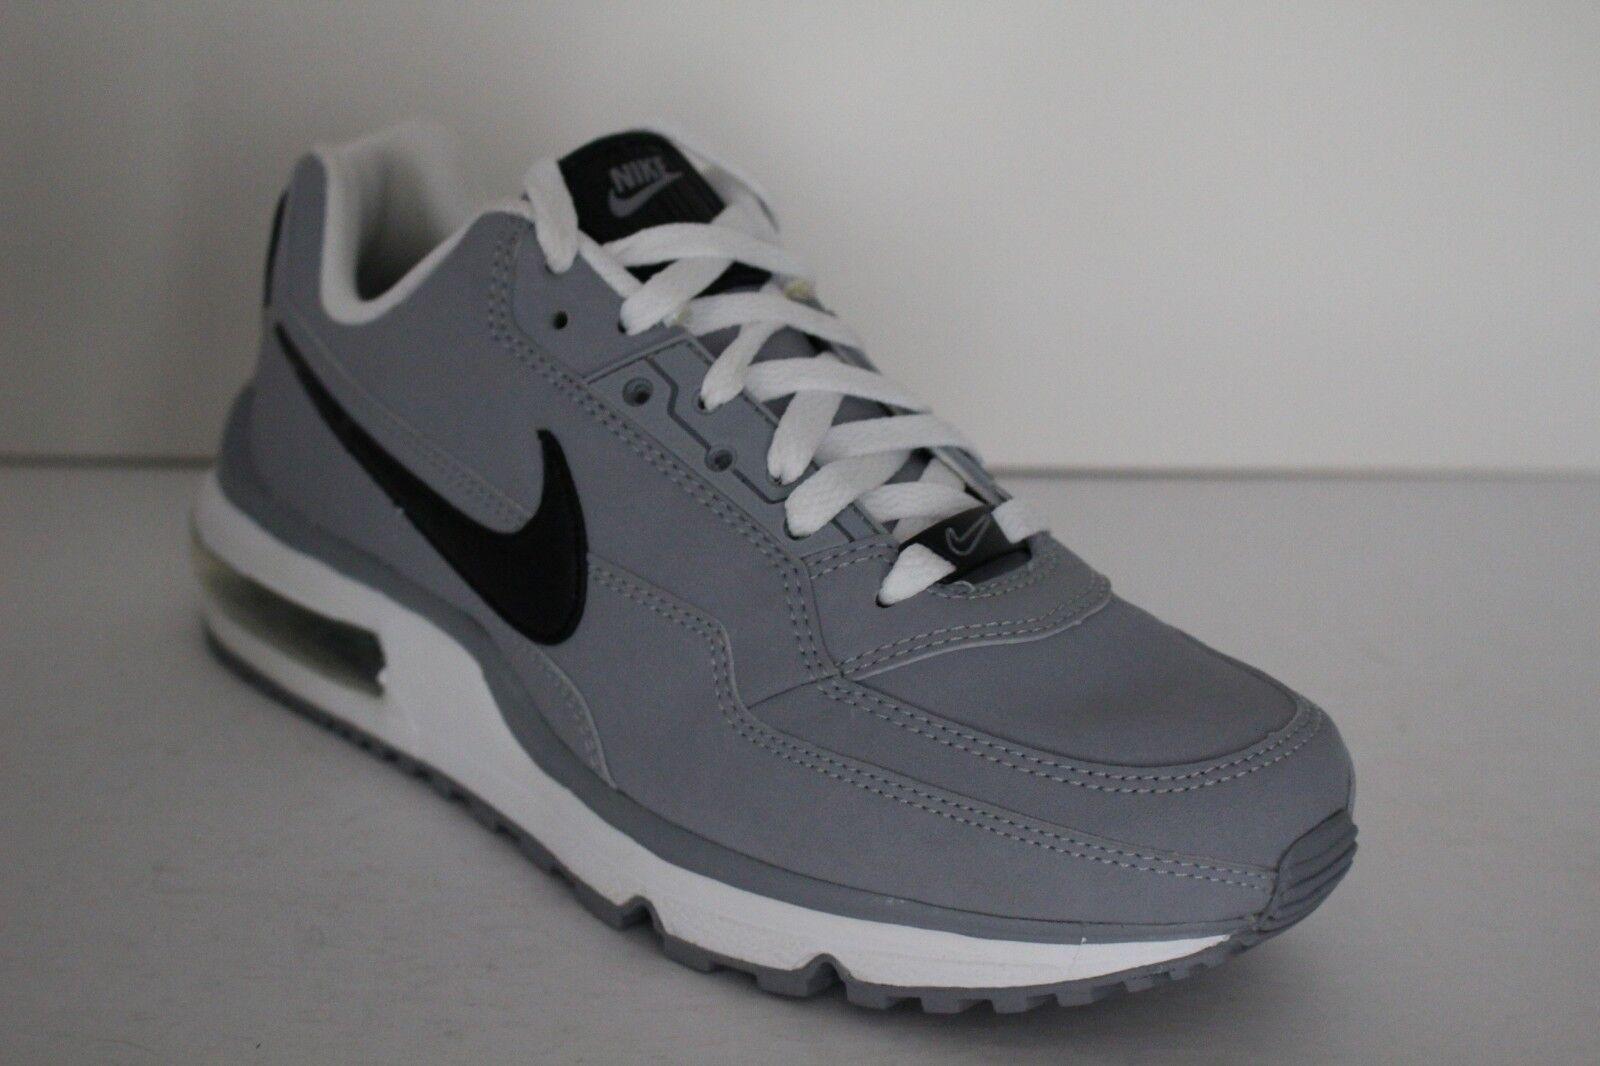 Nike STEALTH Air Max LTD VINTAGE Retro Rare Men's Sz 8 Running scarpe 311000 002